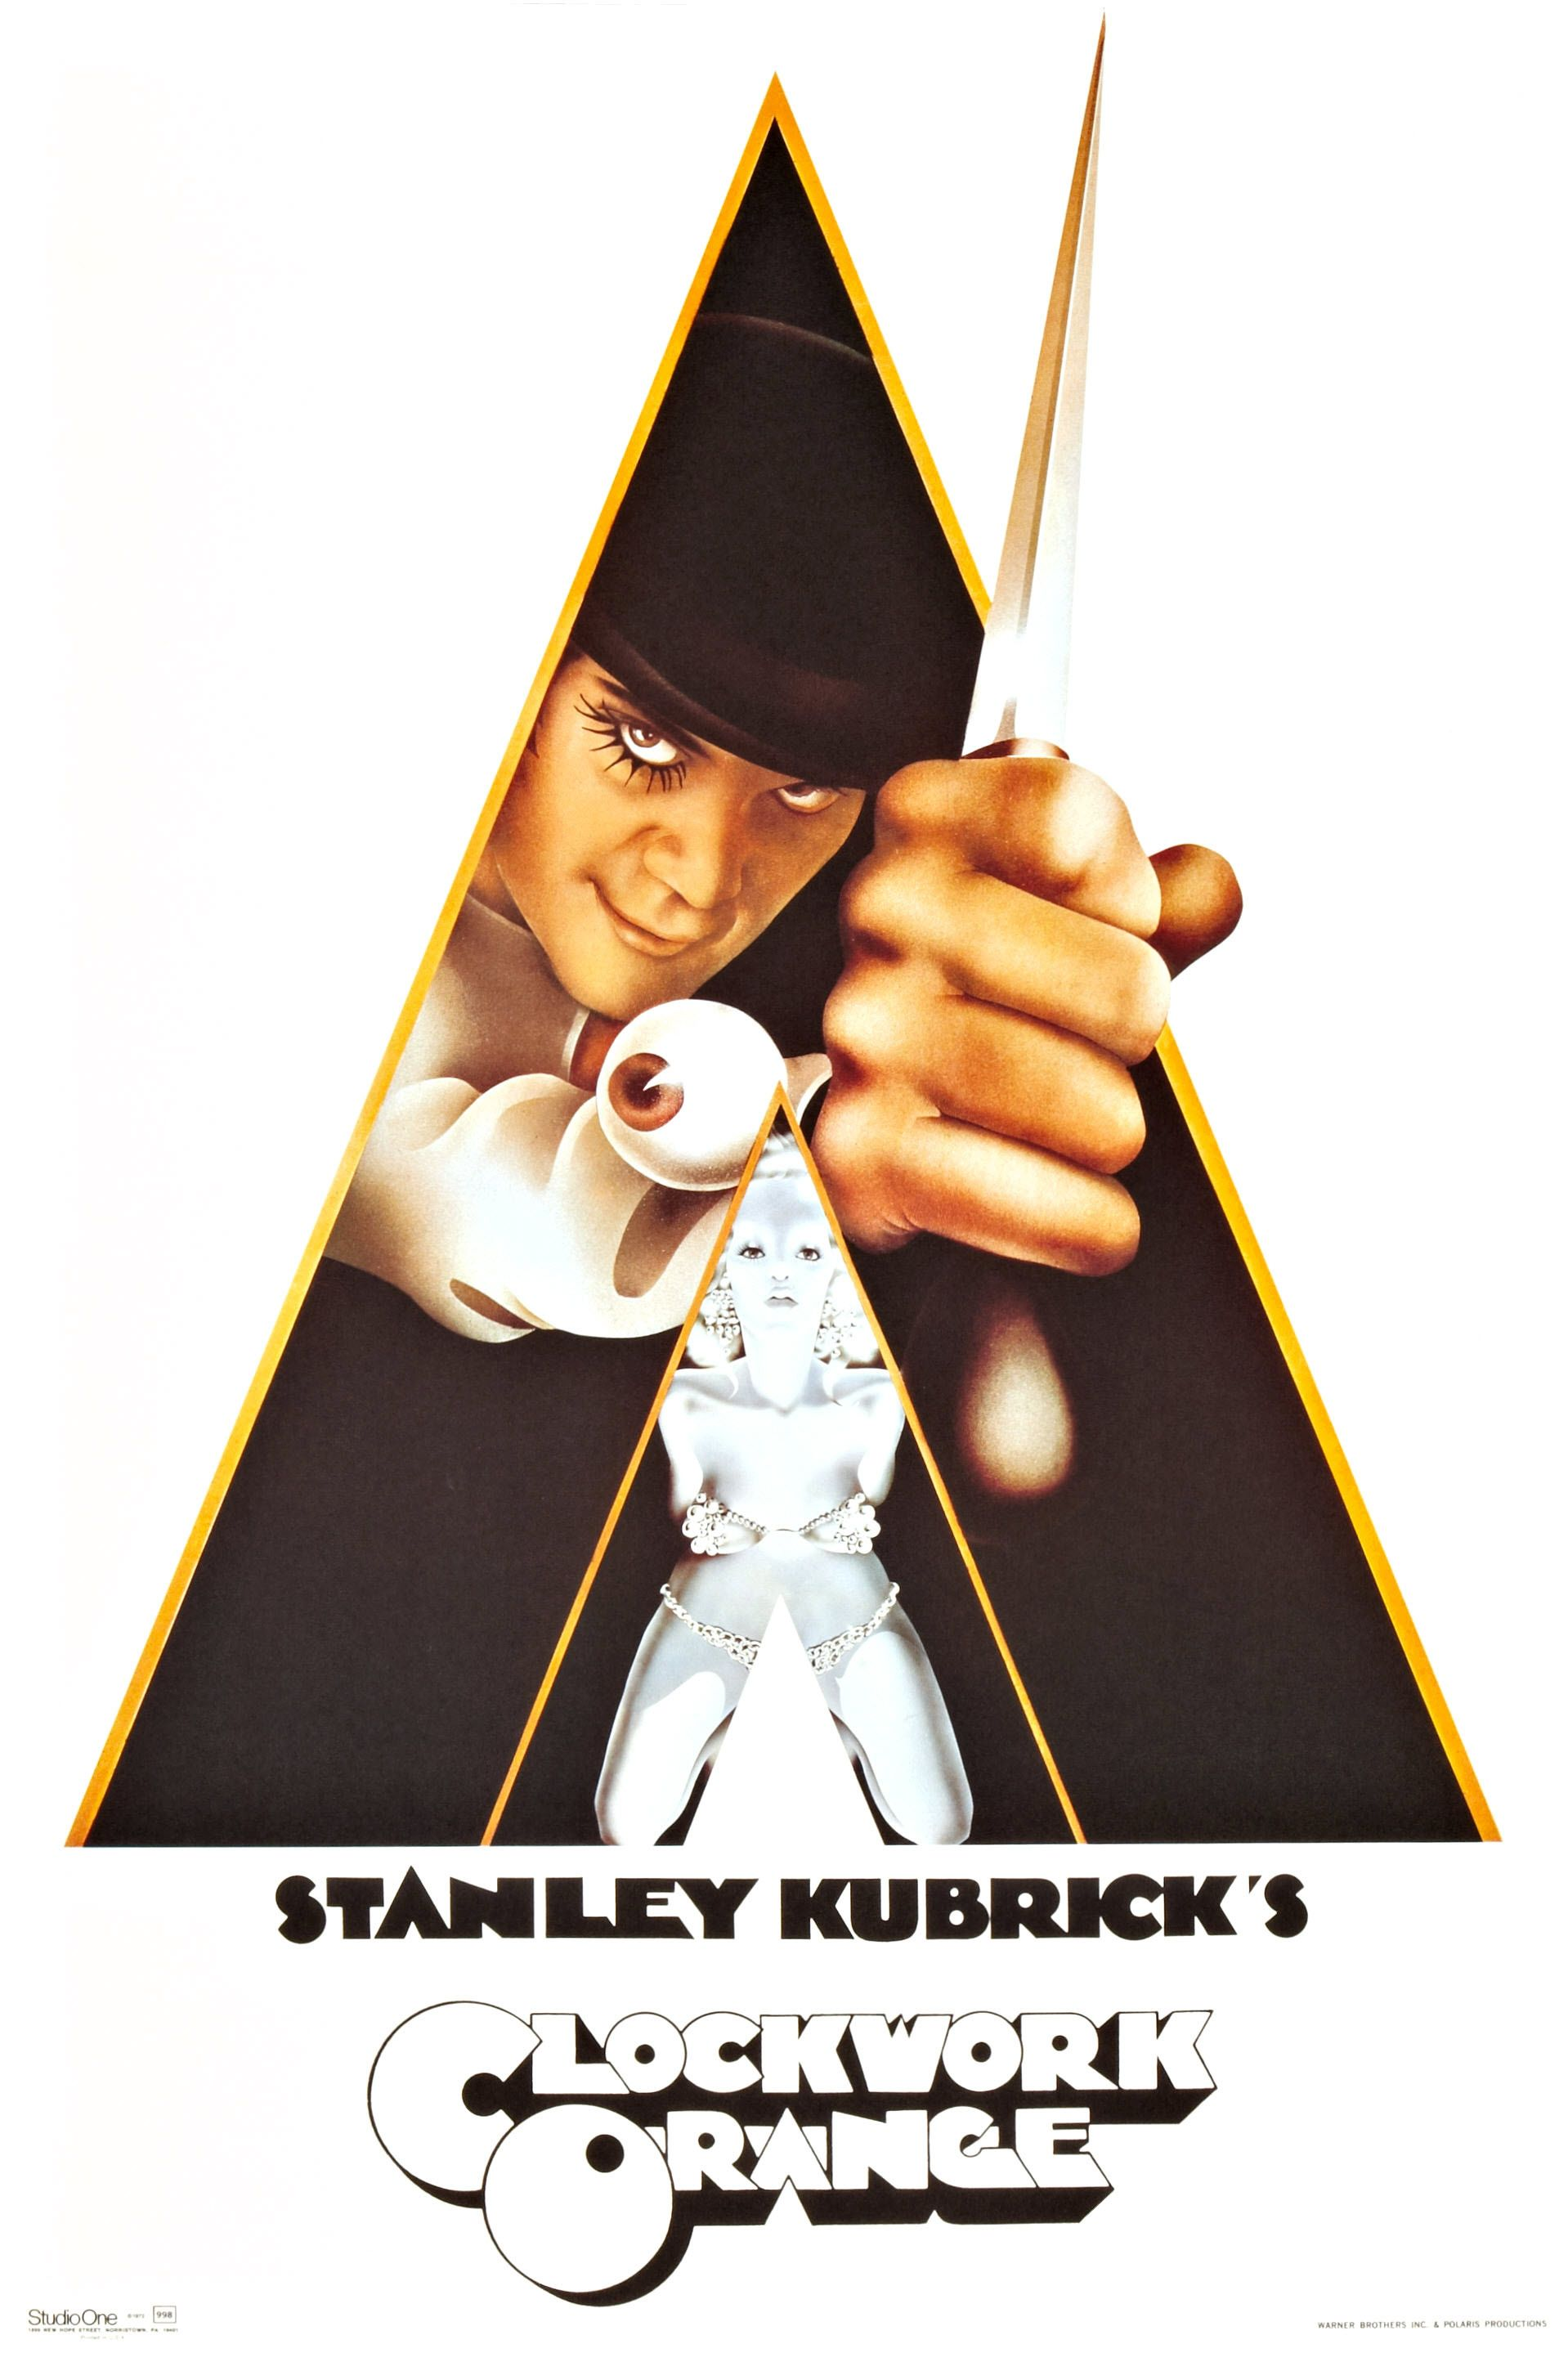 clockwork orange movie poster - Pesquisa do Google   T en ... A Clockwork Orange Movie Poster Original